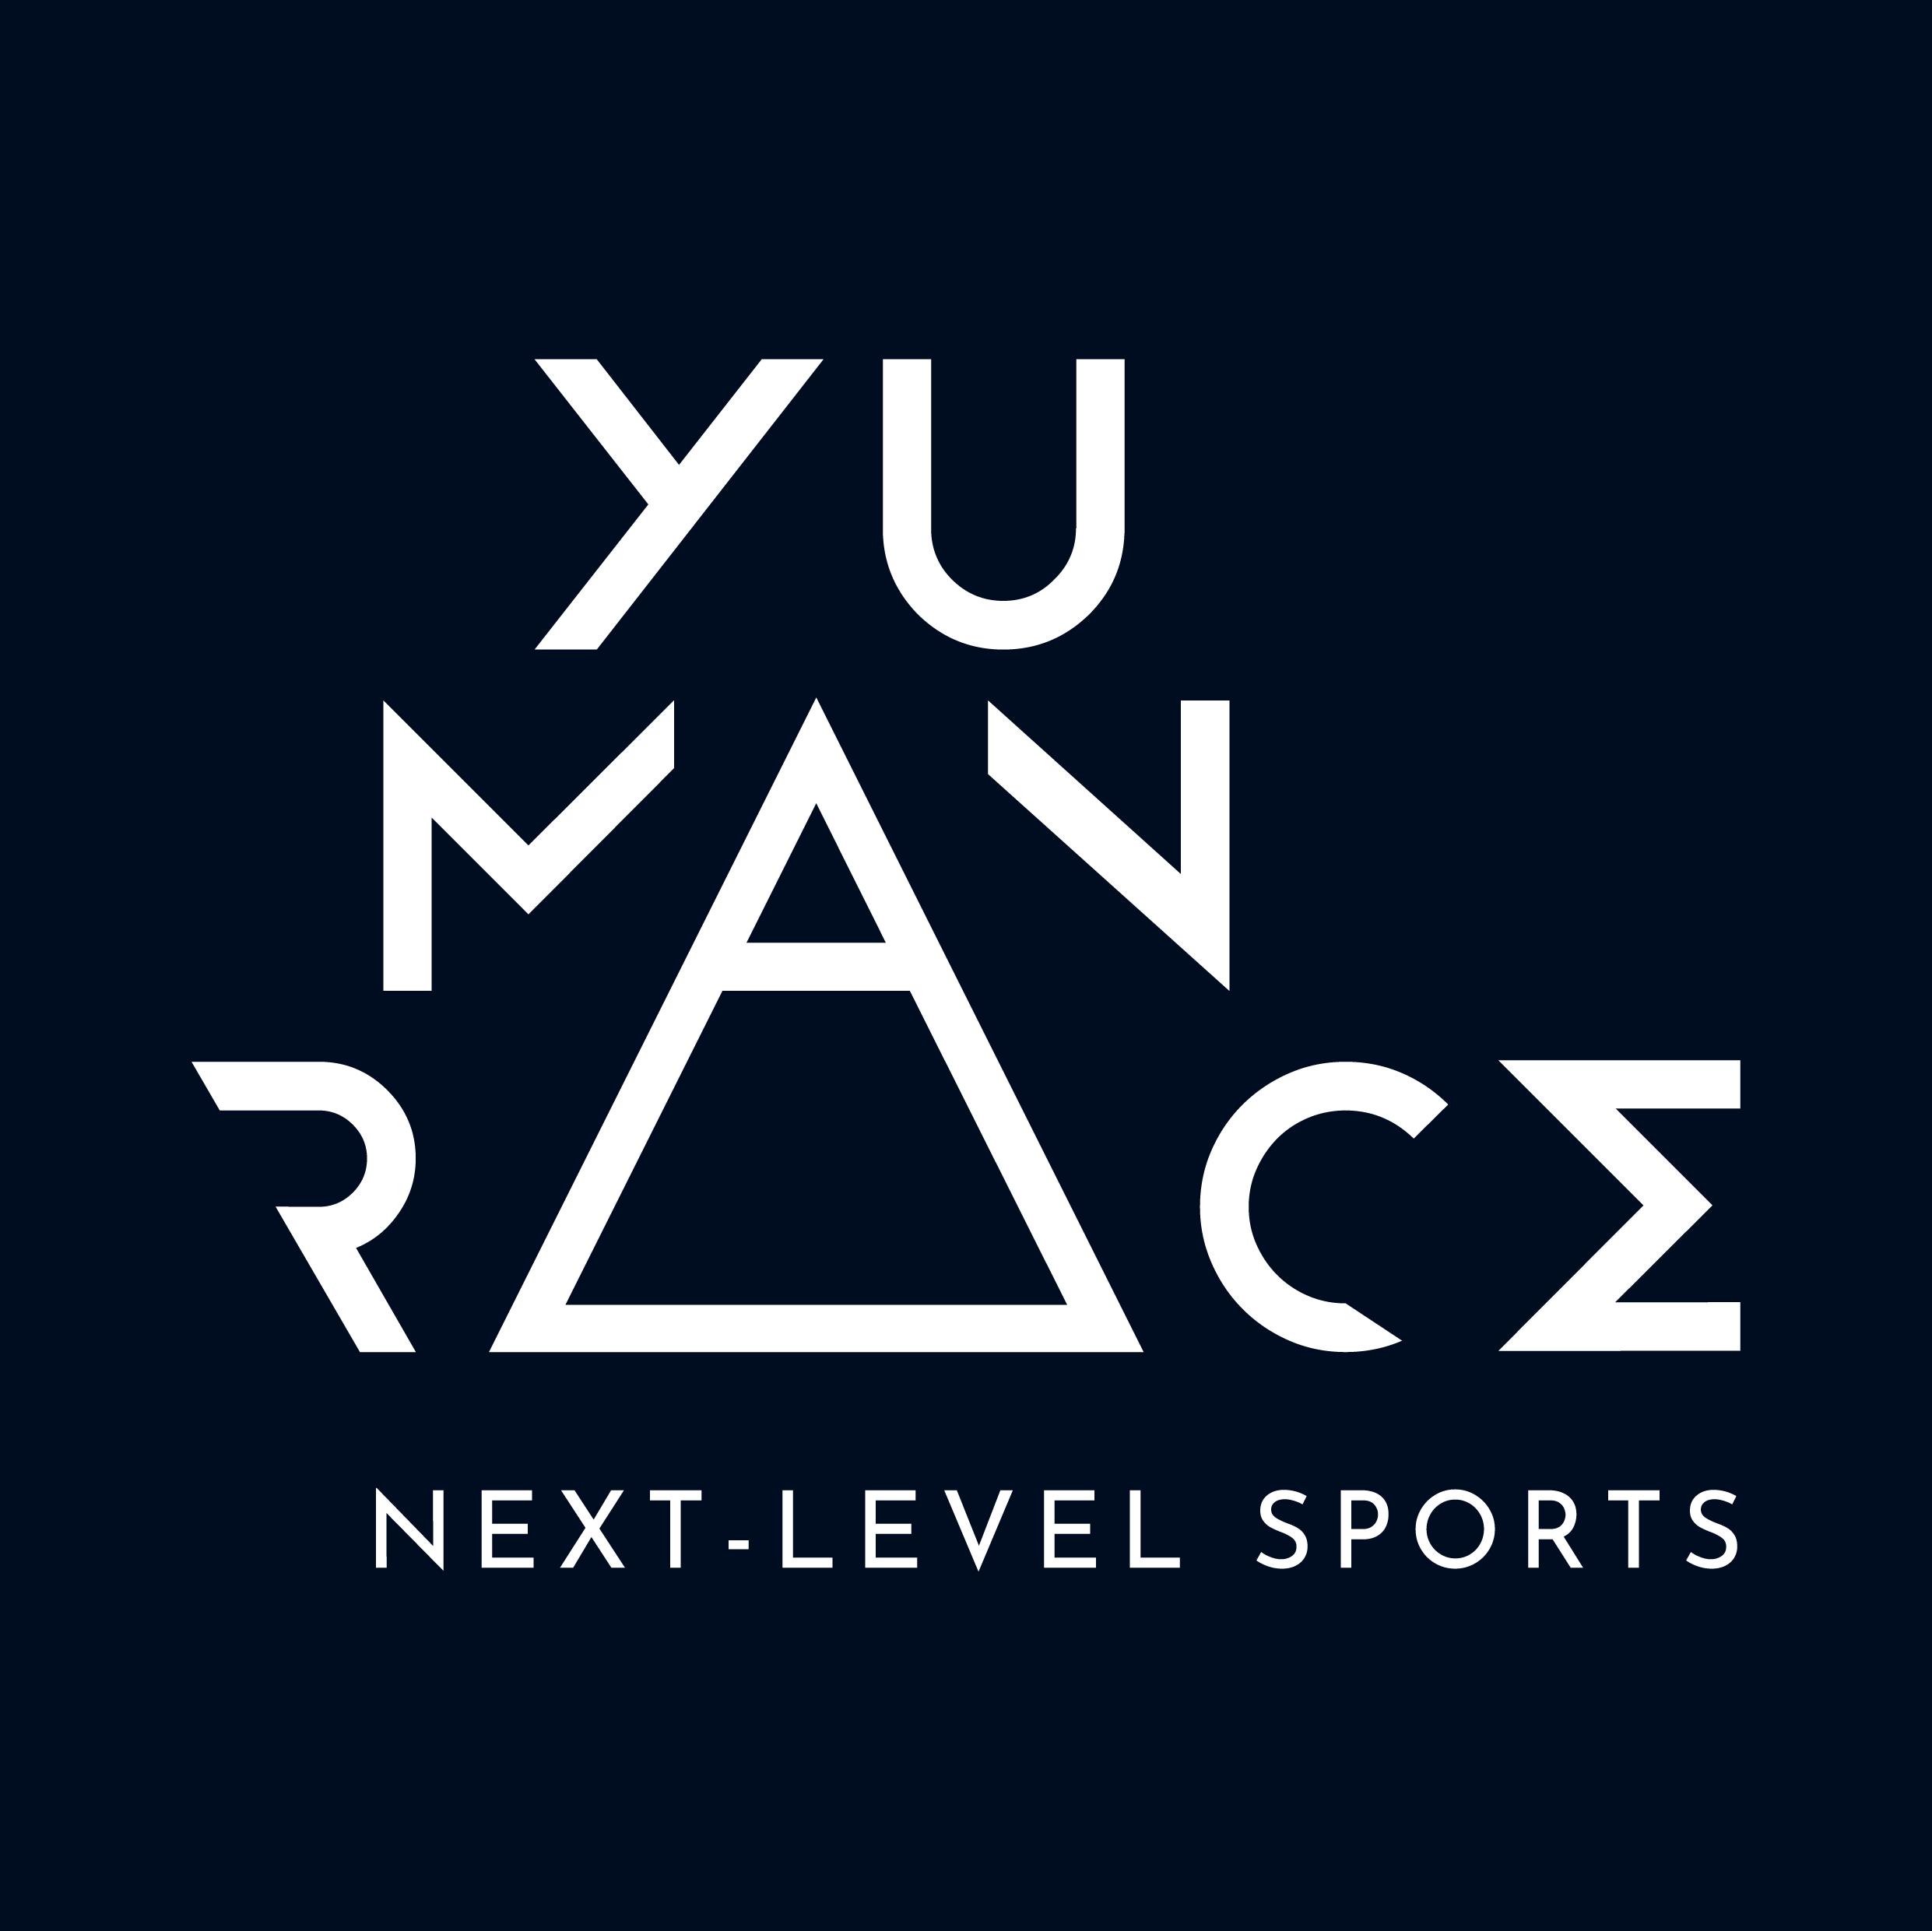 YU MAN RACE